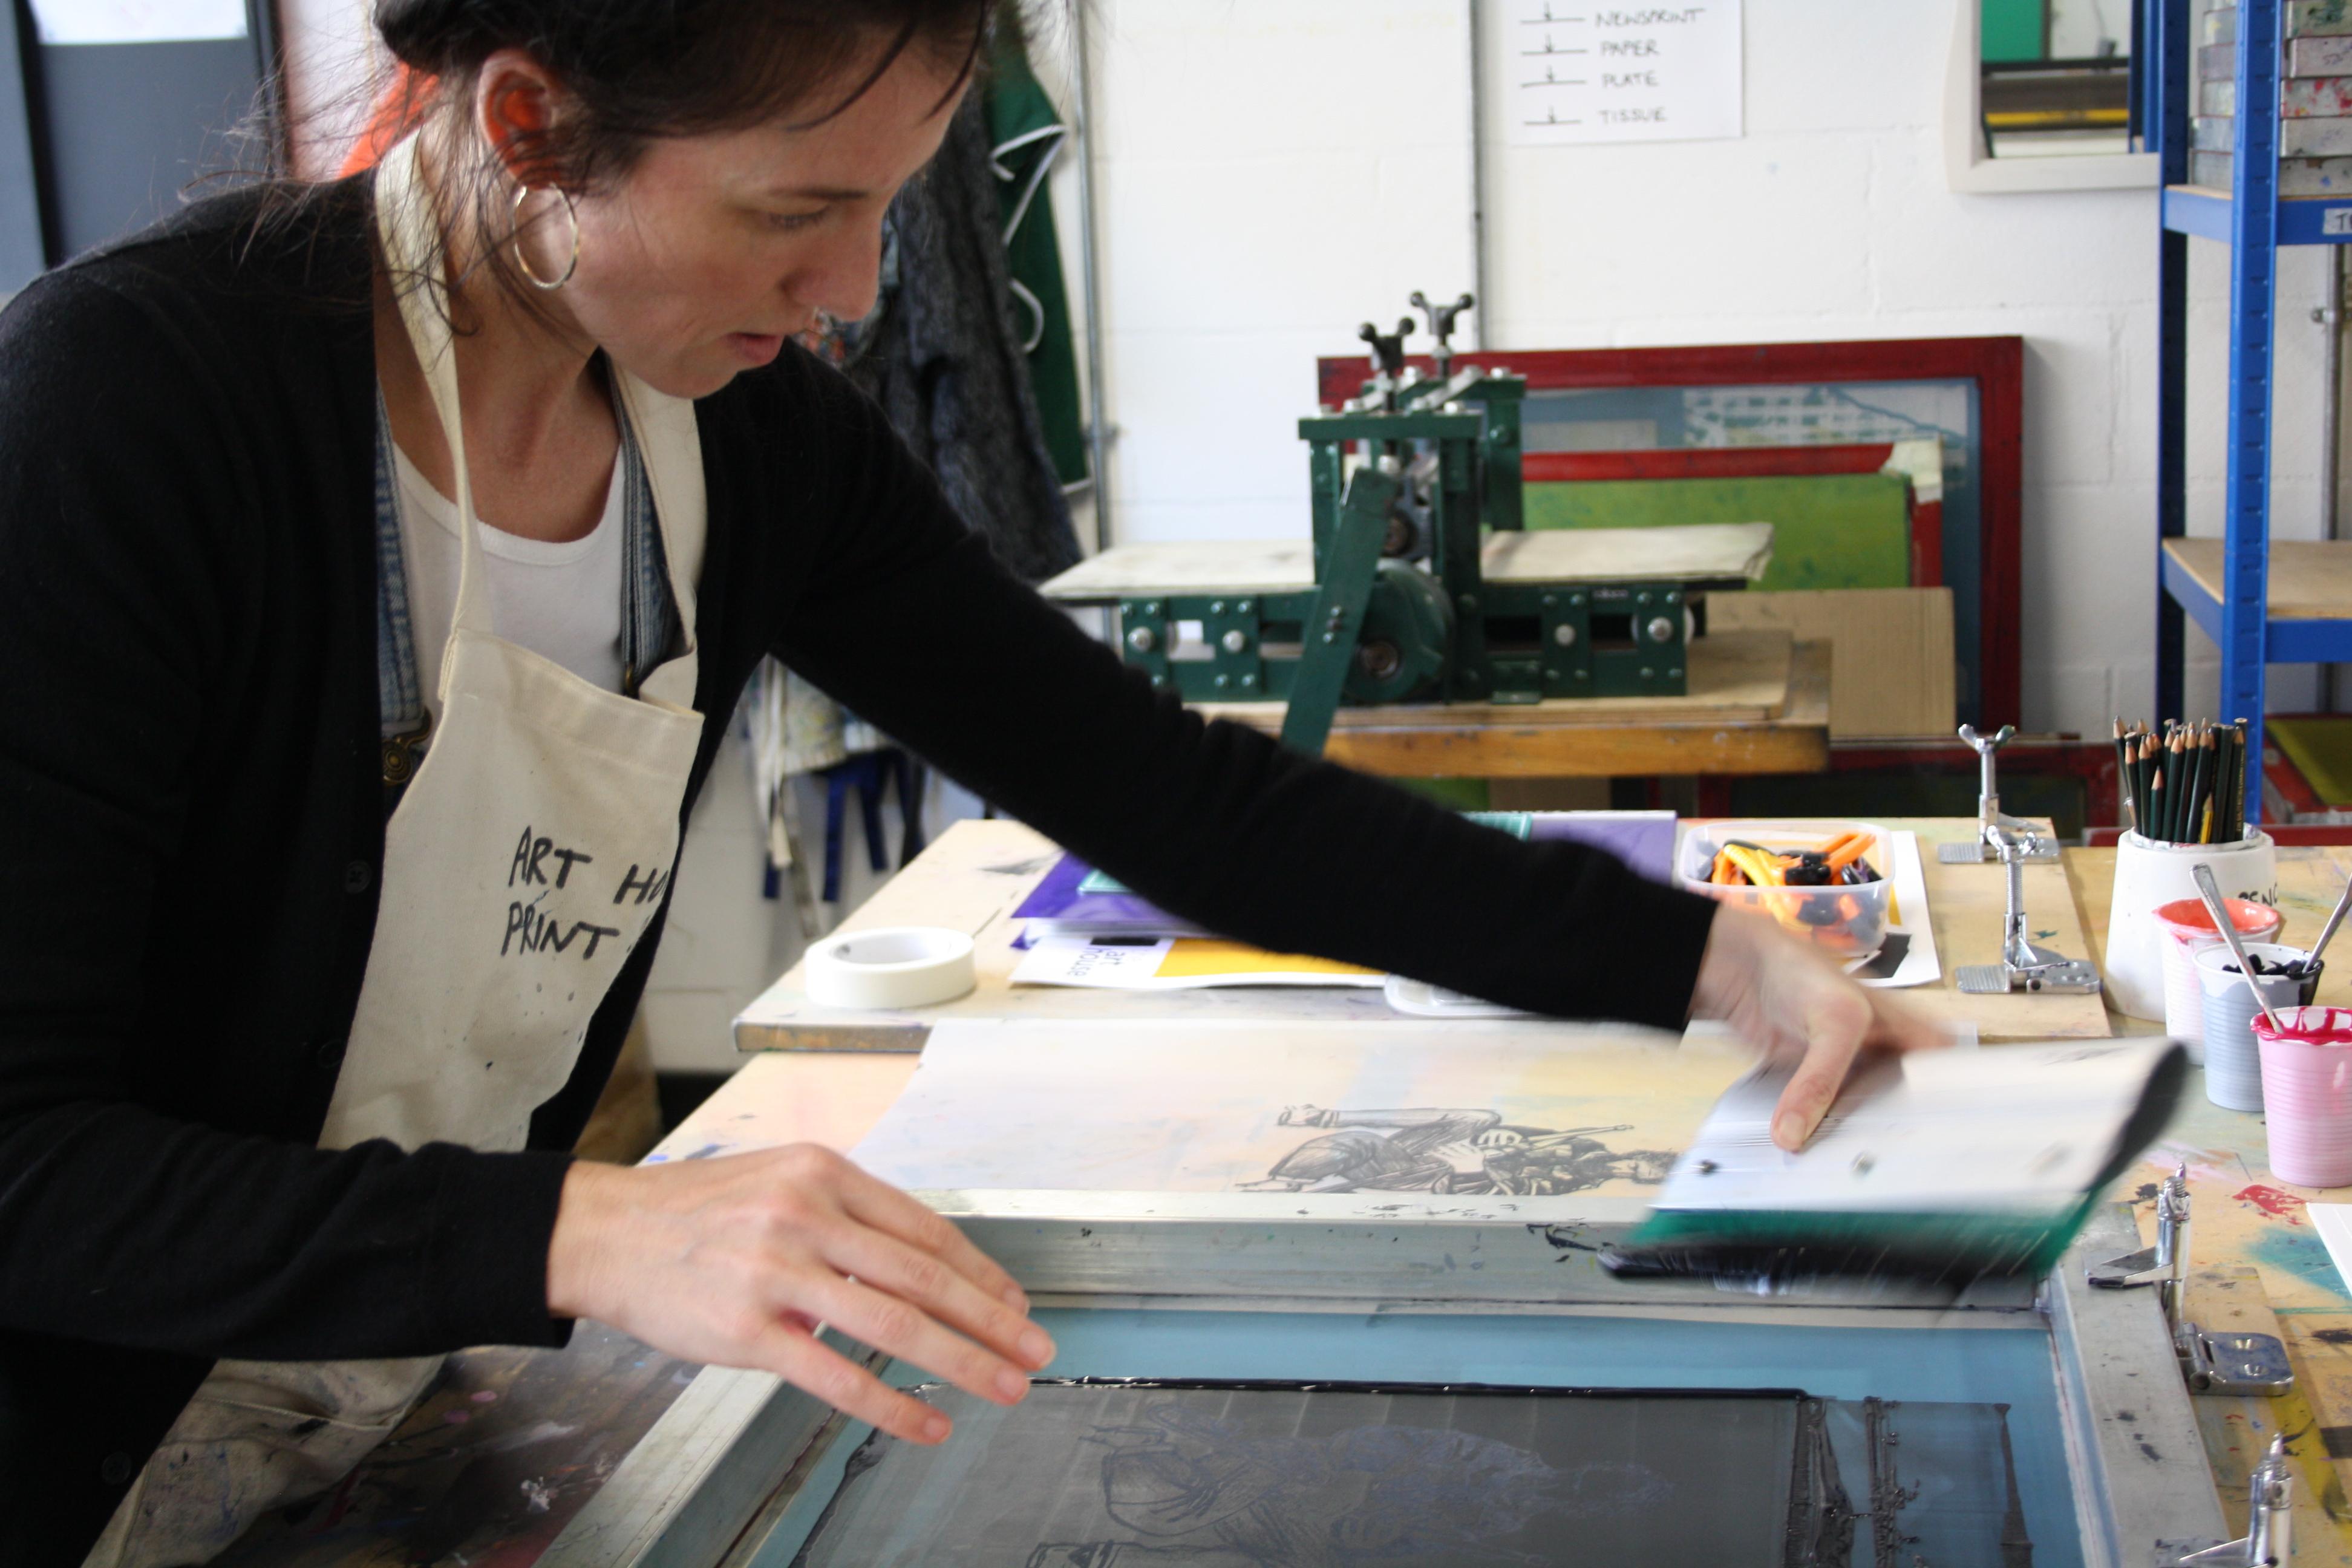 Print membership at The Art House, Wakefield